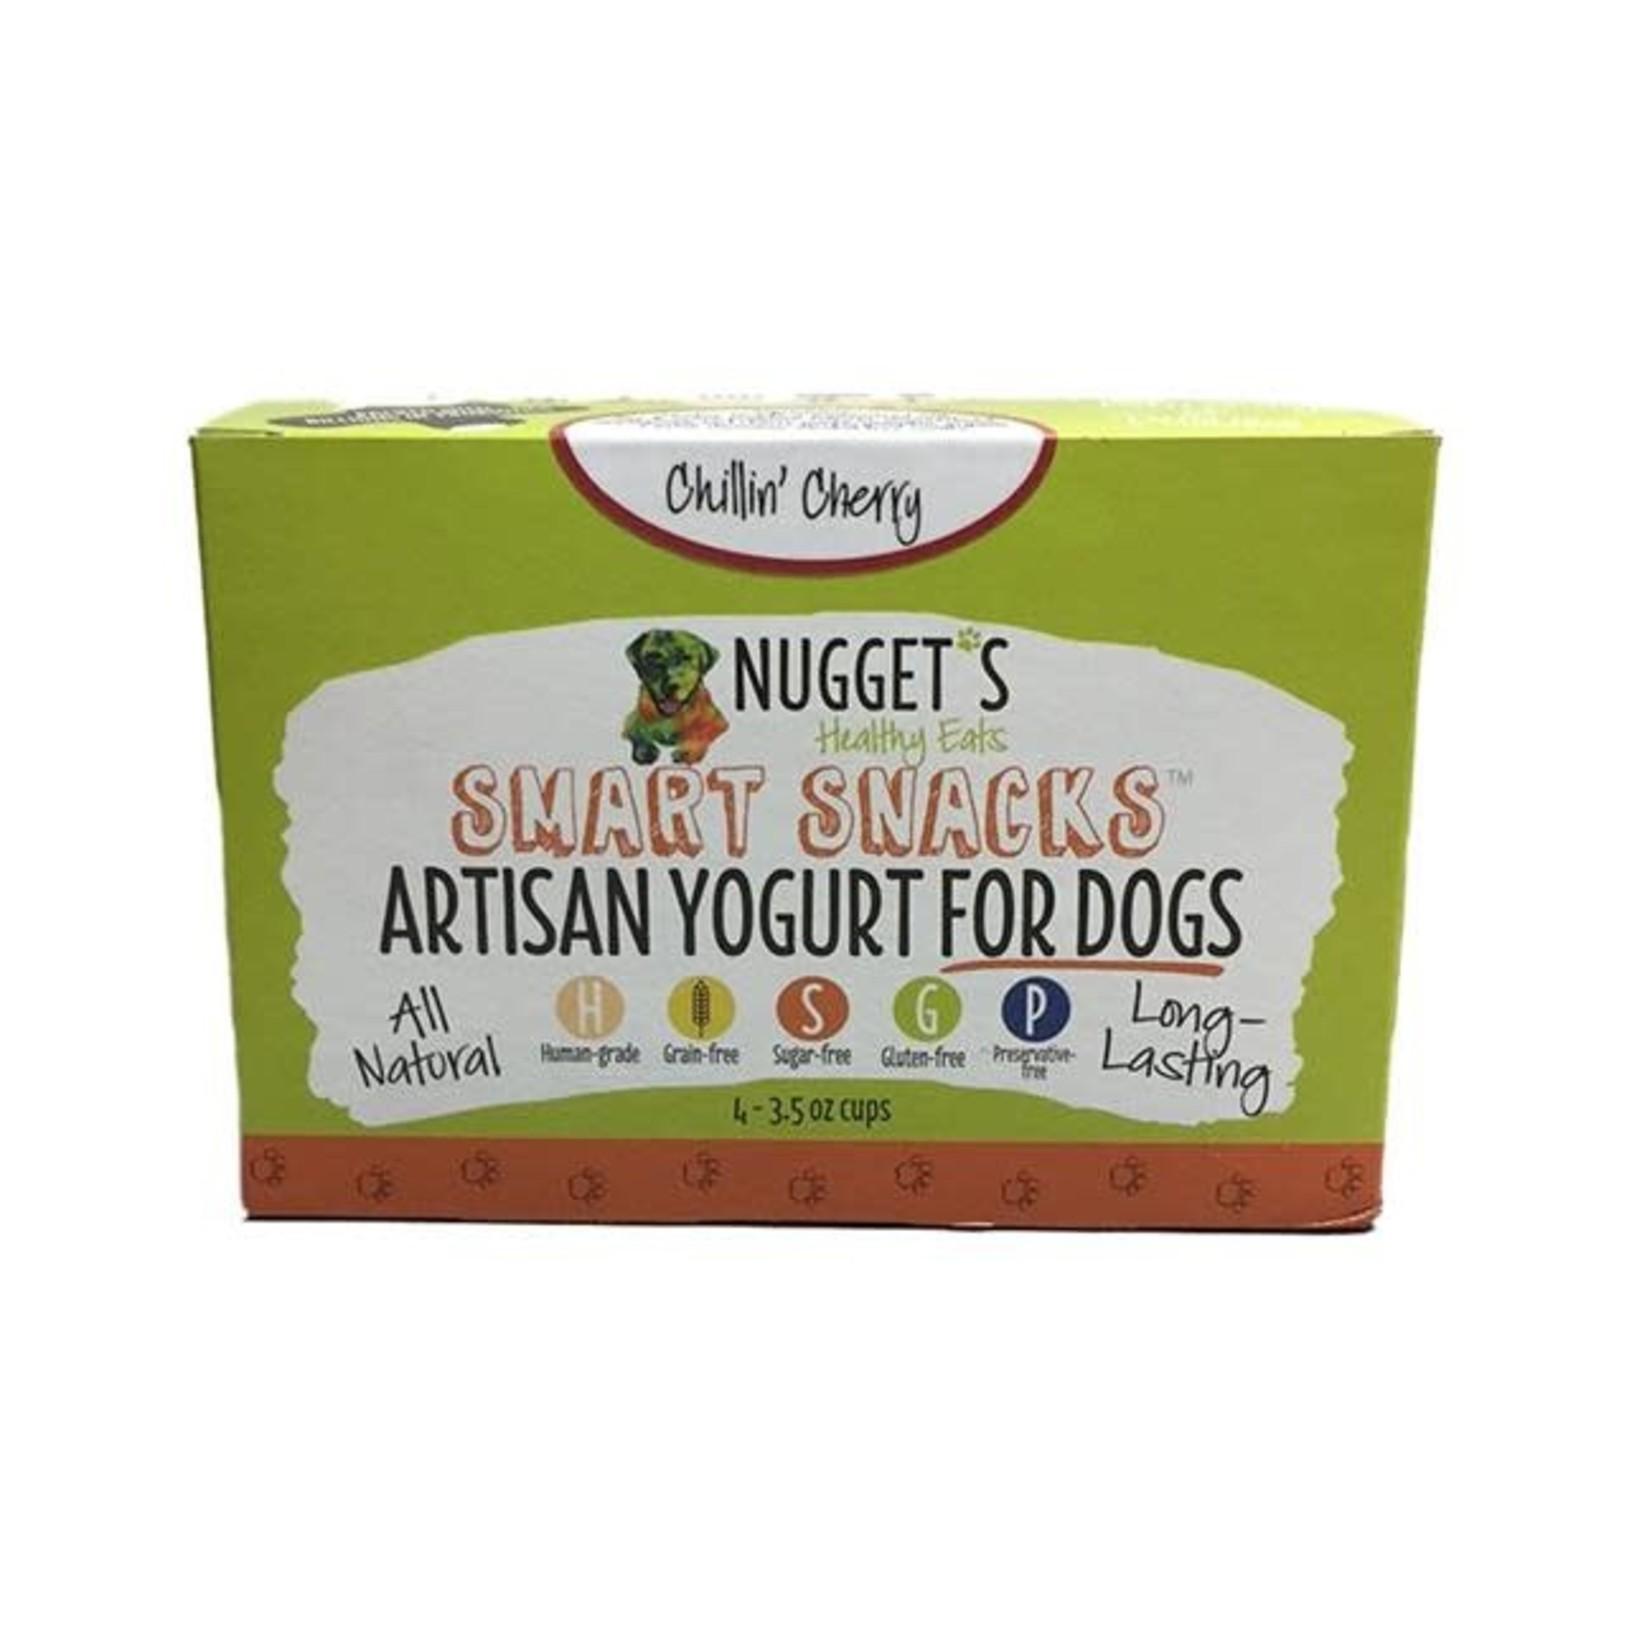 Nugget's Healthy Eats Nugget's Healthy Eats FZ Yogurt Chillin' Cherry 4 Pack